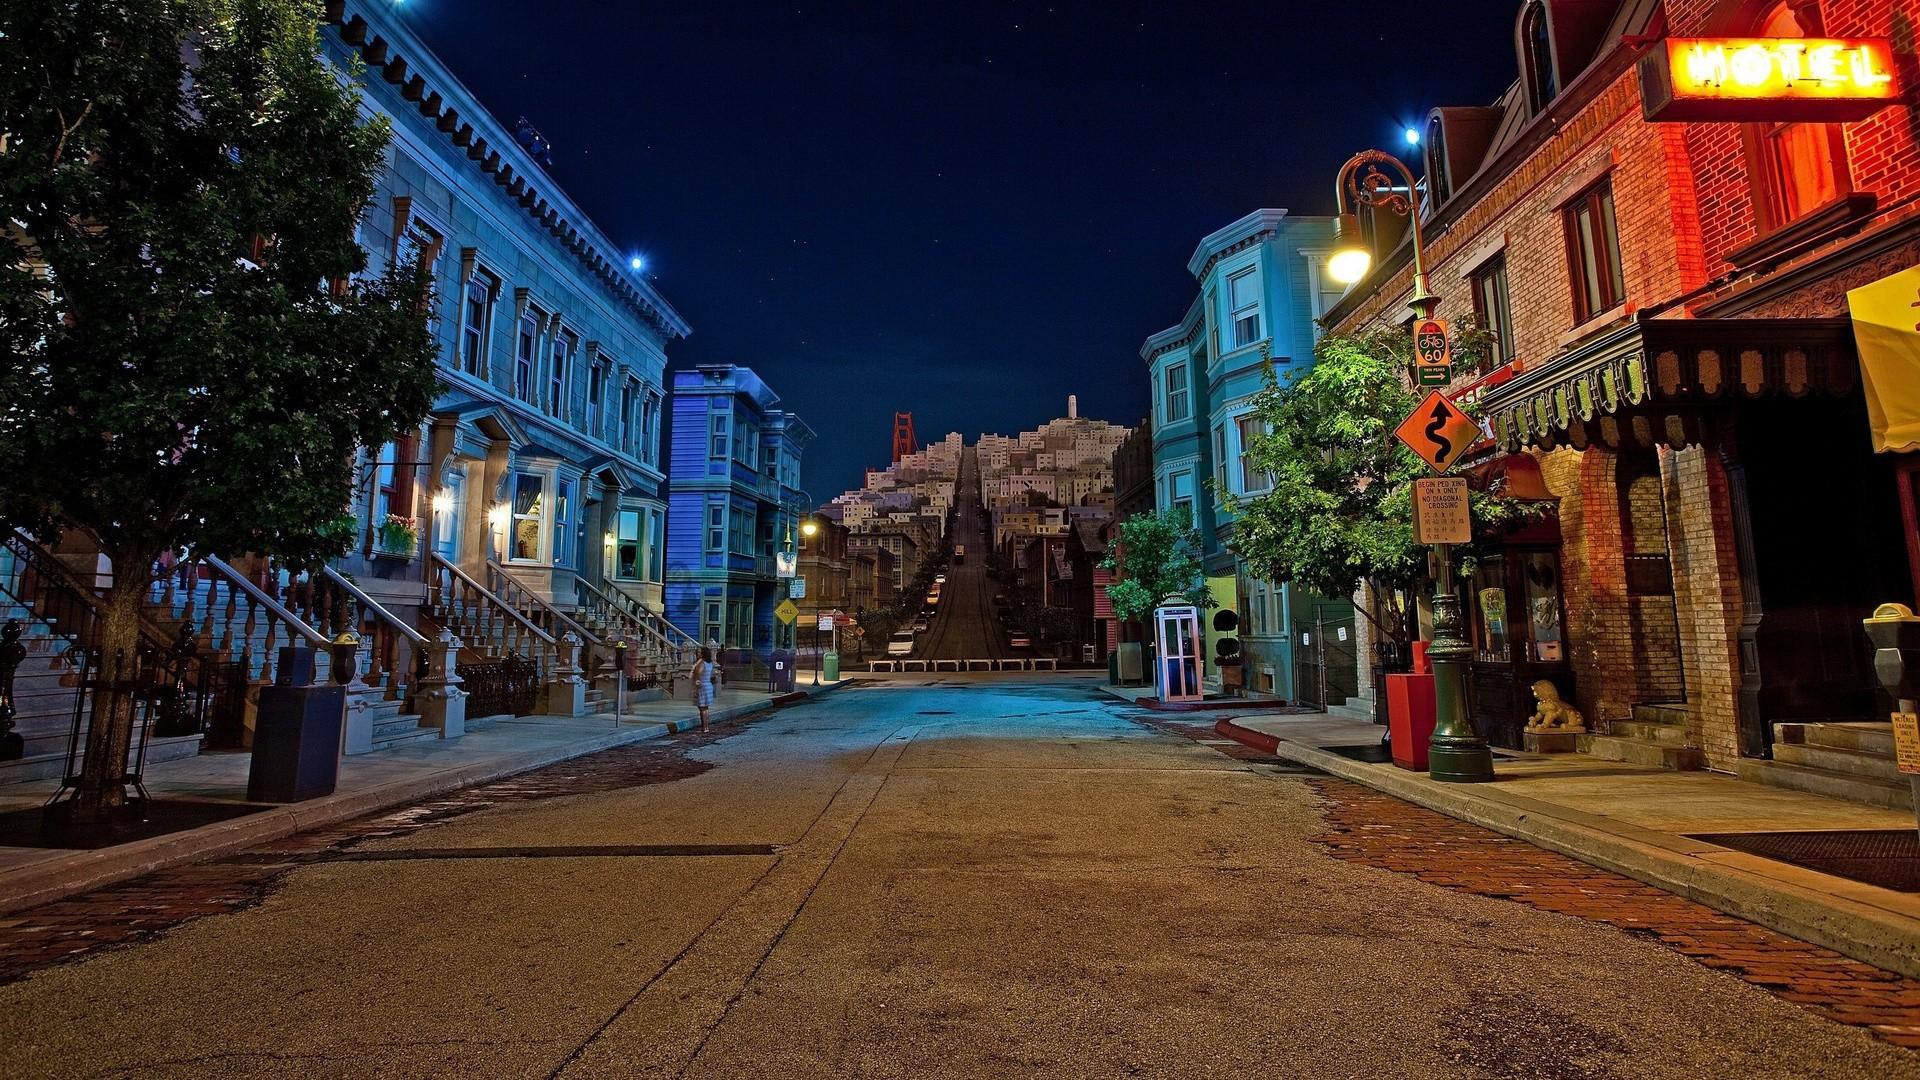 City Street at Night   STREETS NIGHT   Pinterest   Night city, 3d wallpaper  and Wallpaper